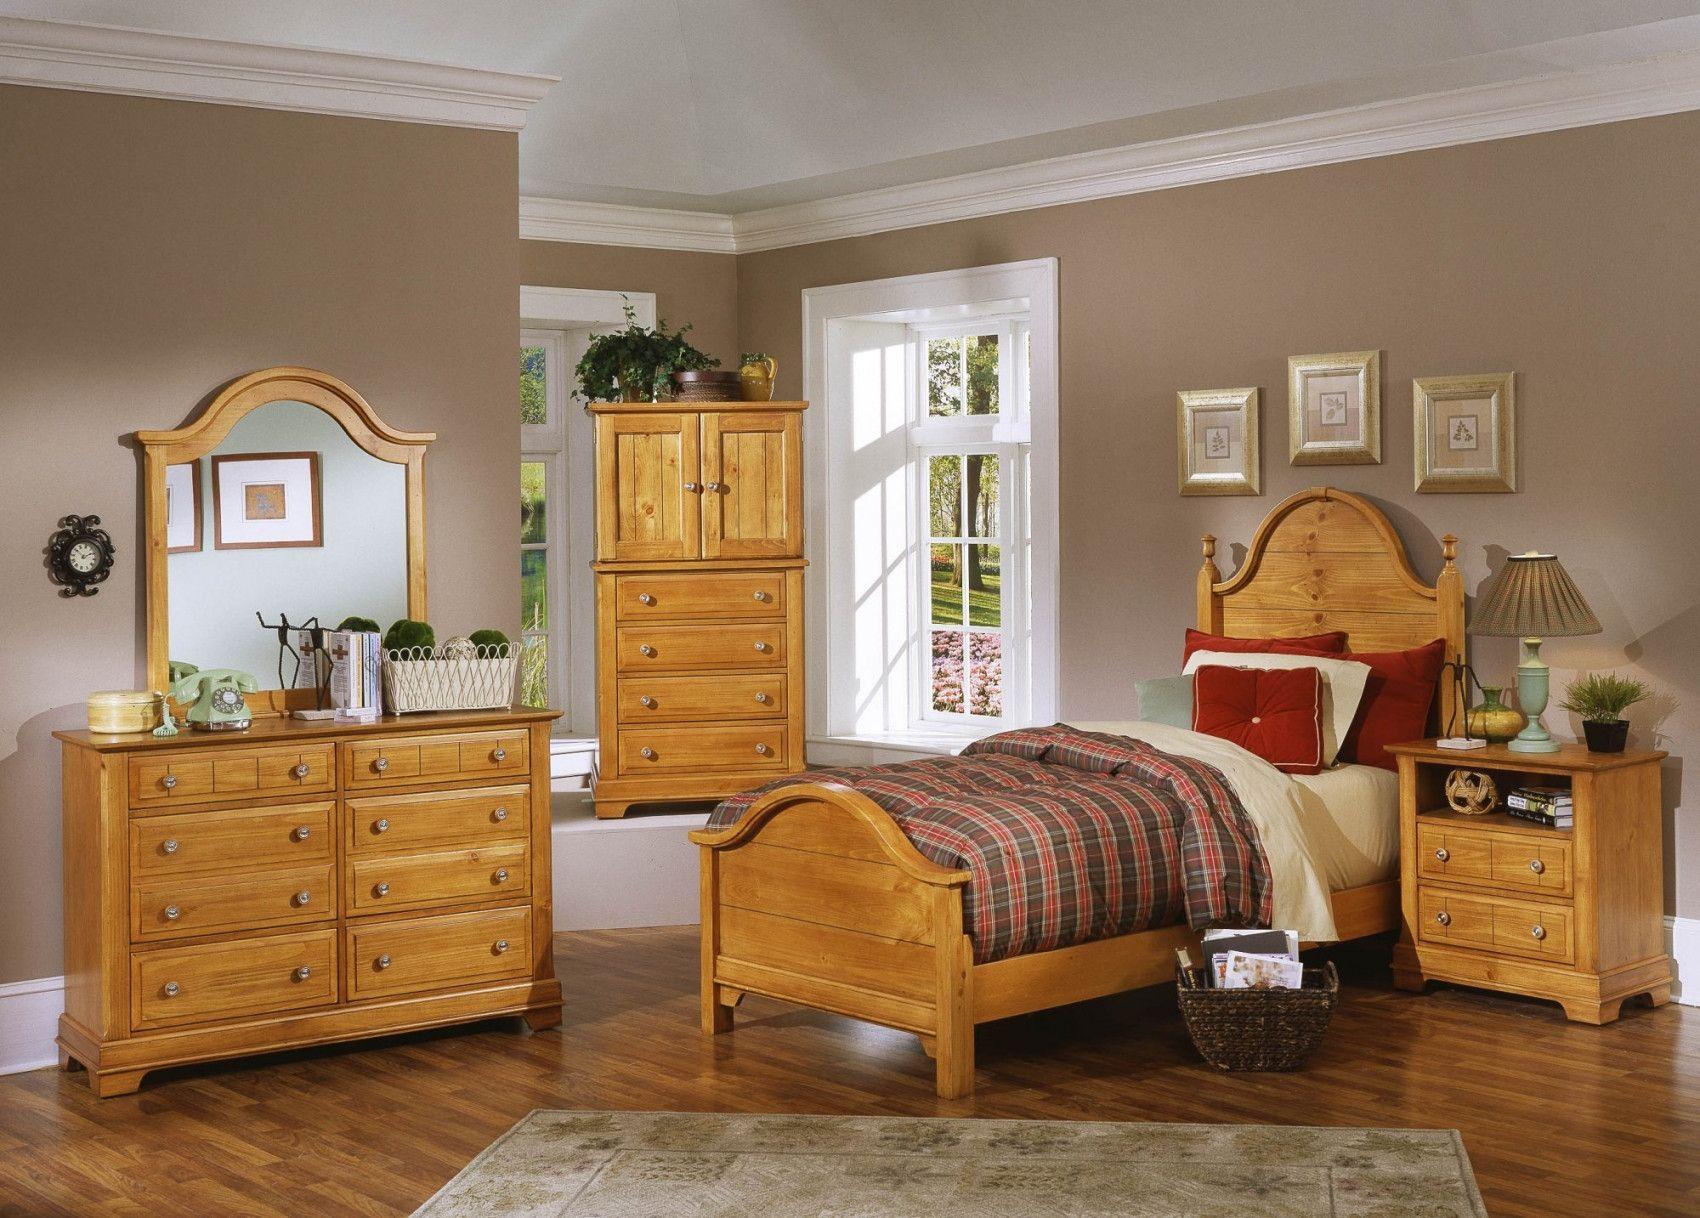 Interior Design Ideas With Pine Furniture Discount Bedroom